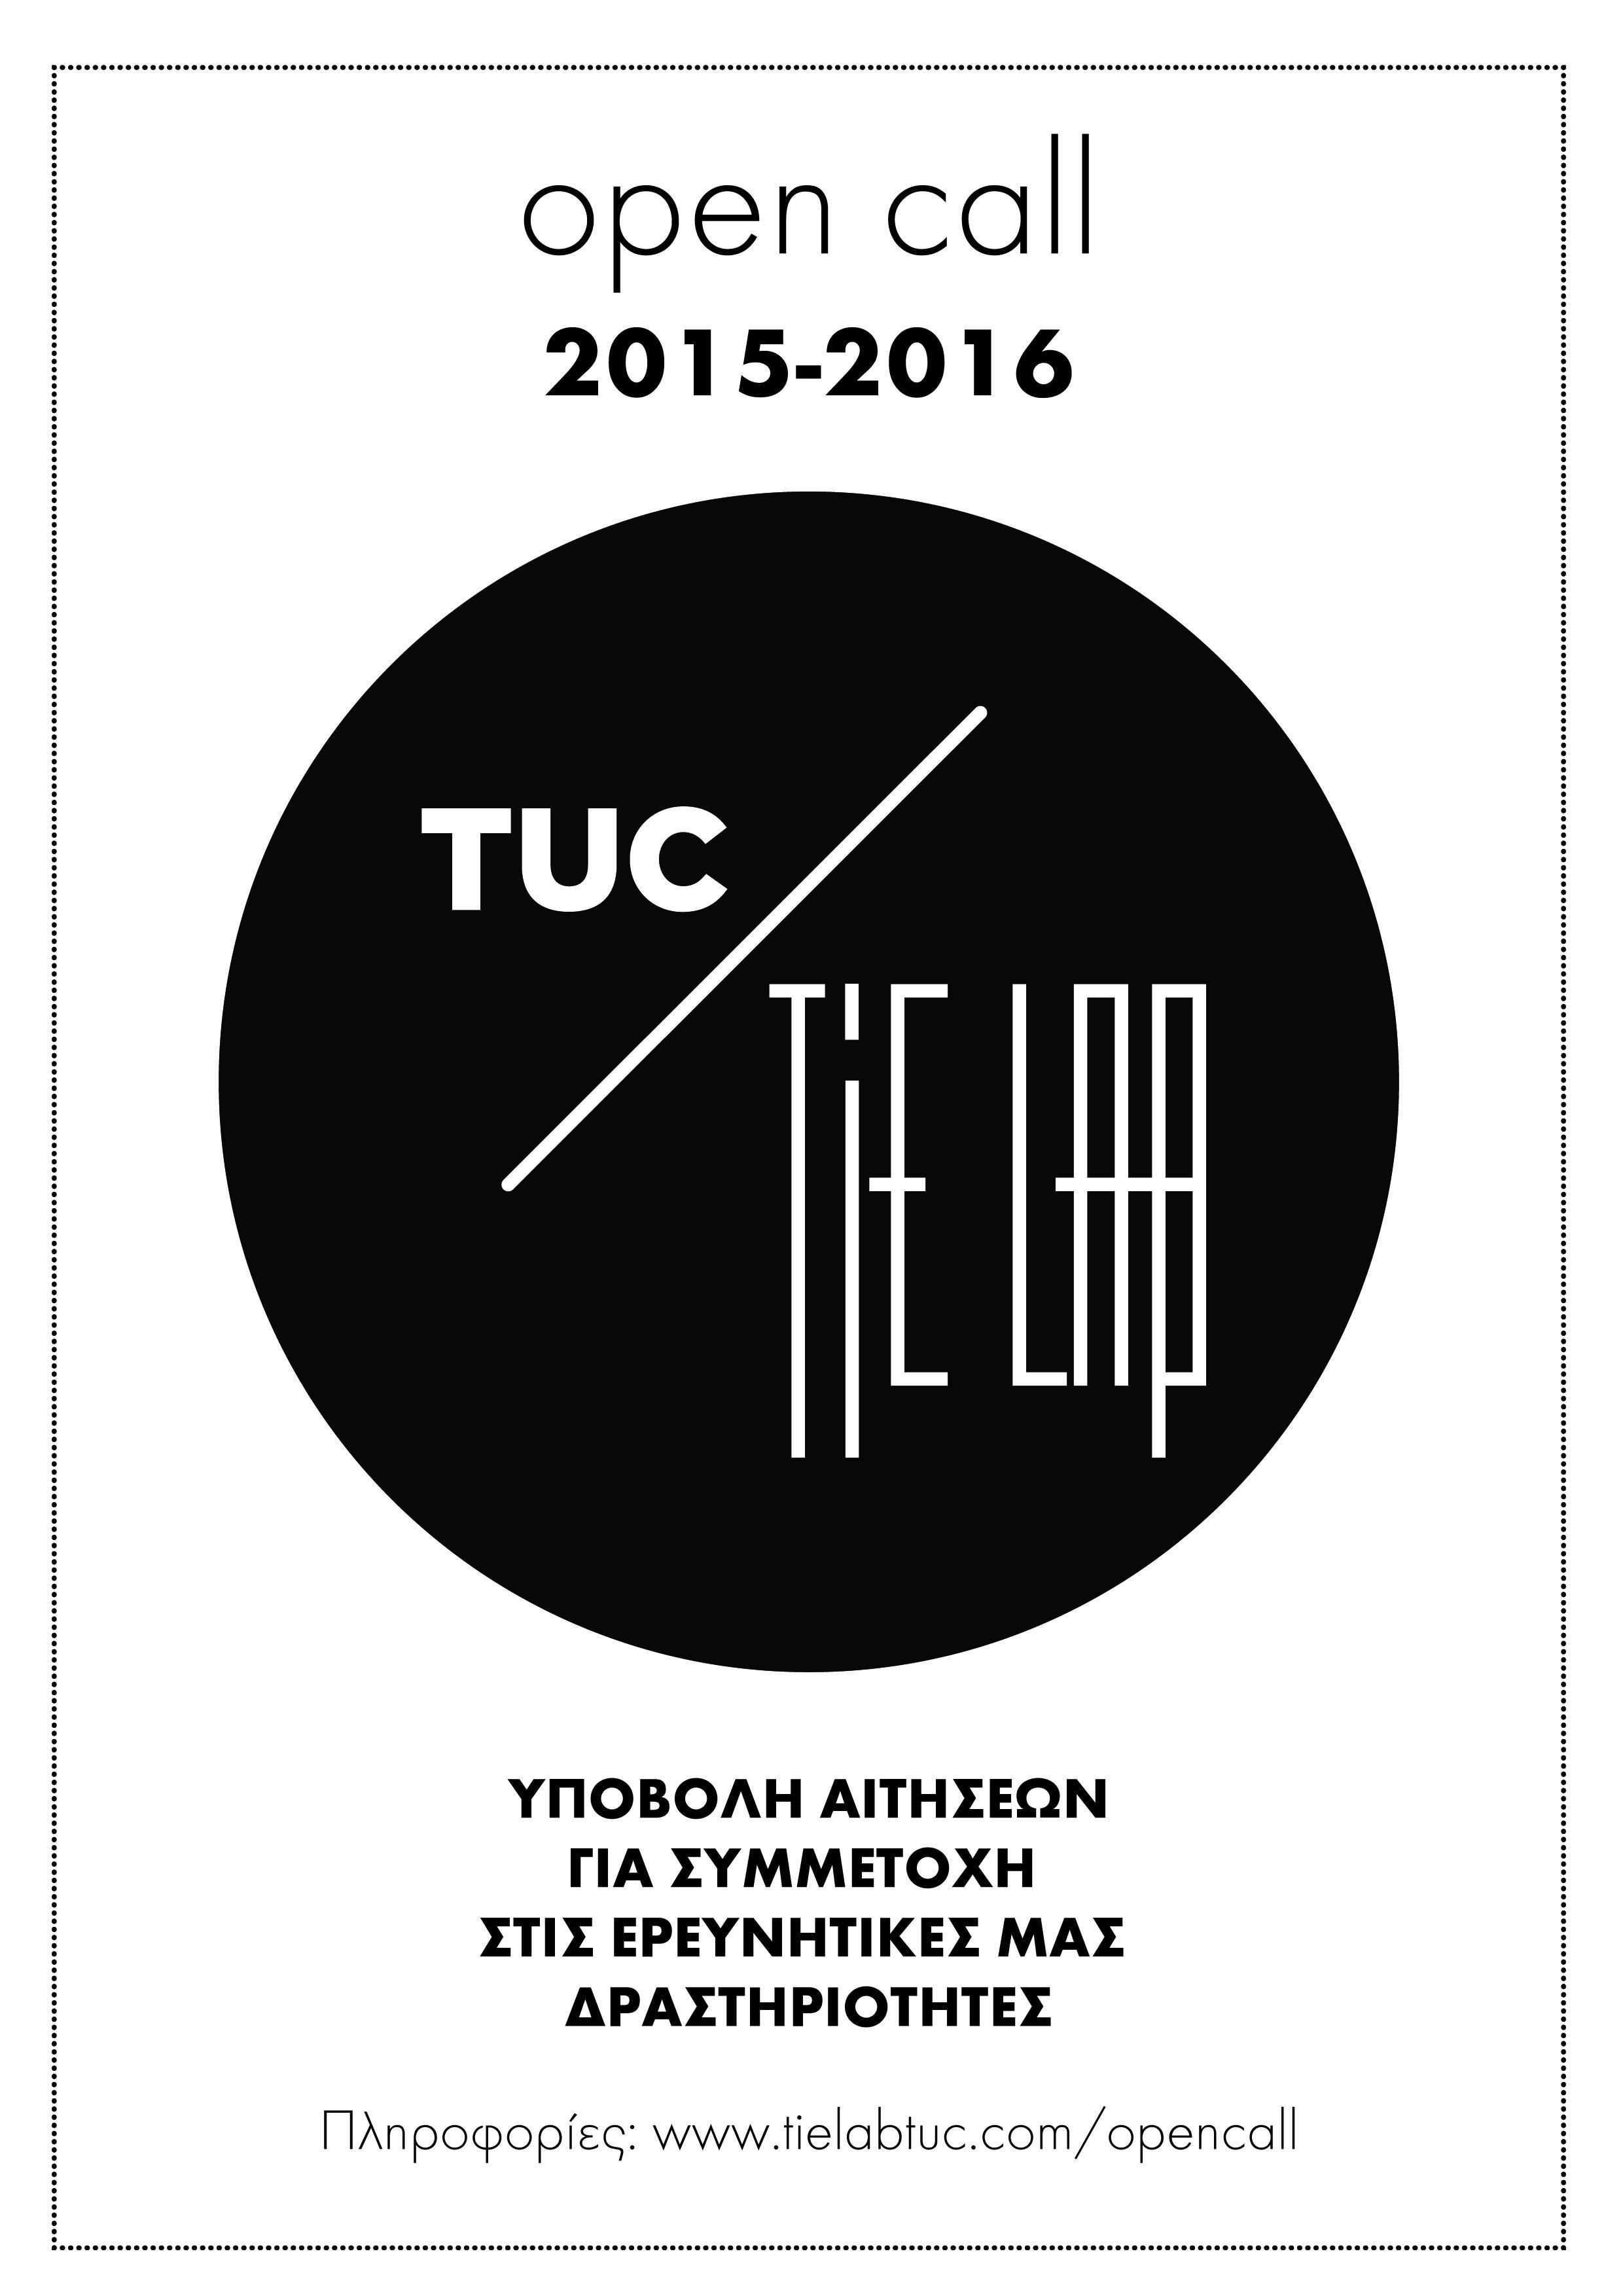 TUC_TIE_Lab_OpenCall_2015-16.jpg